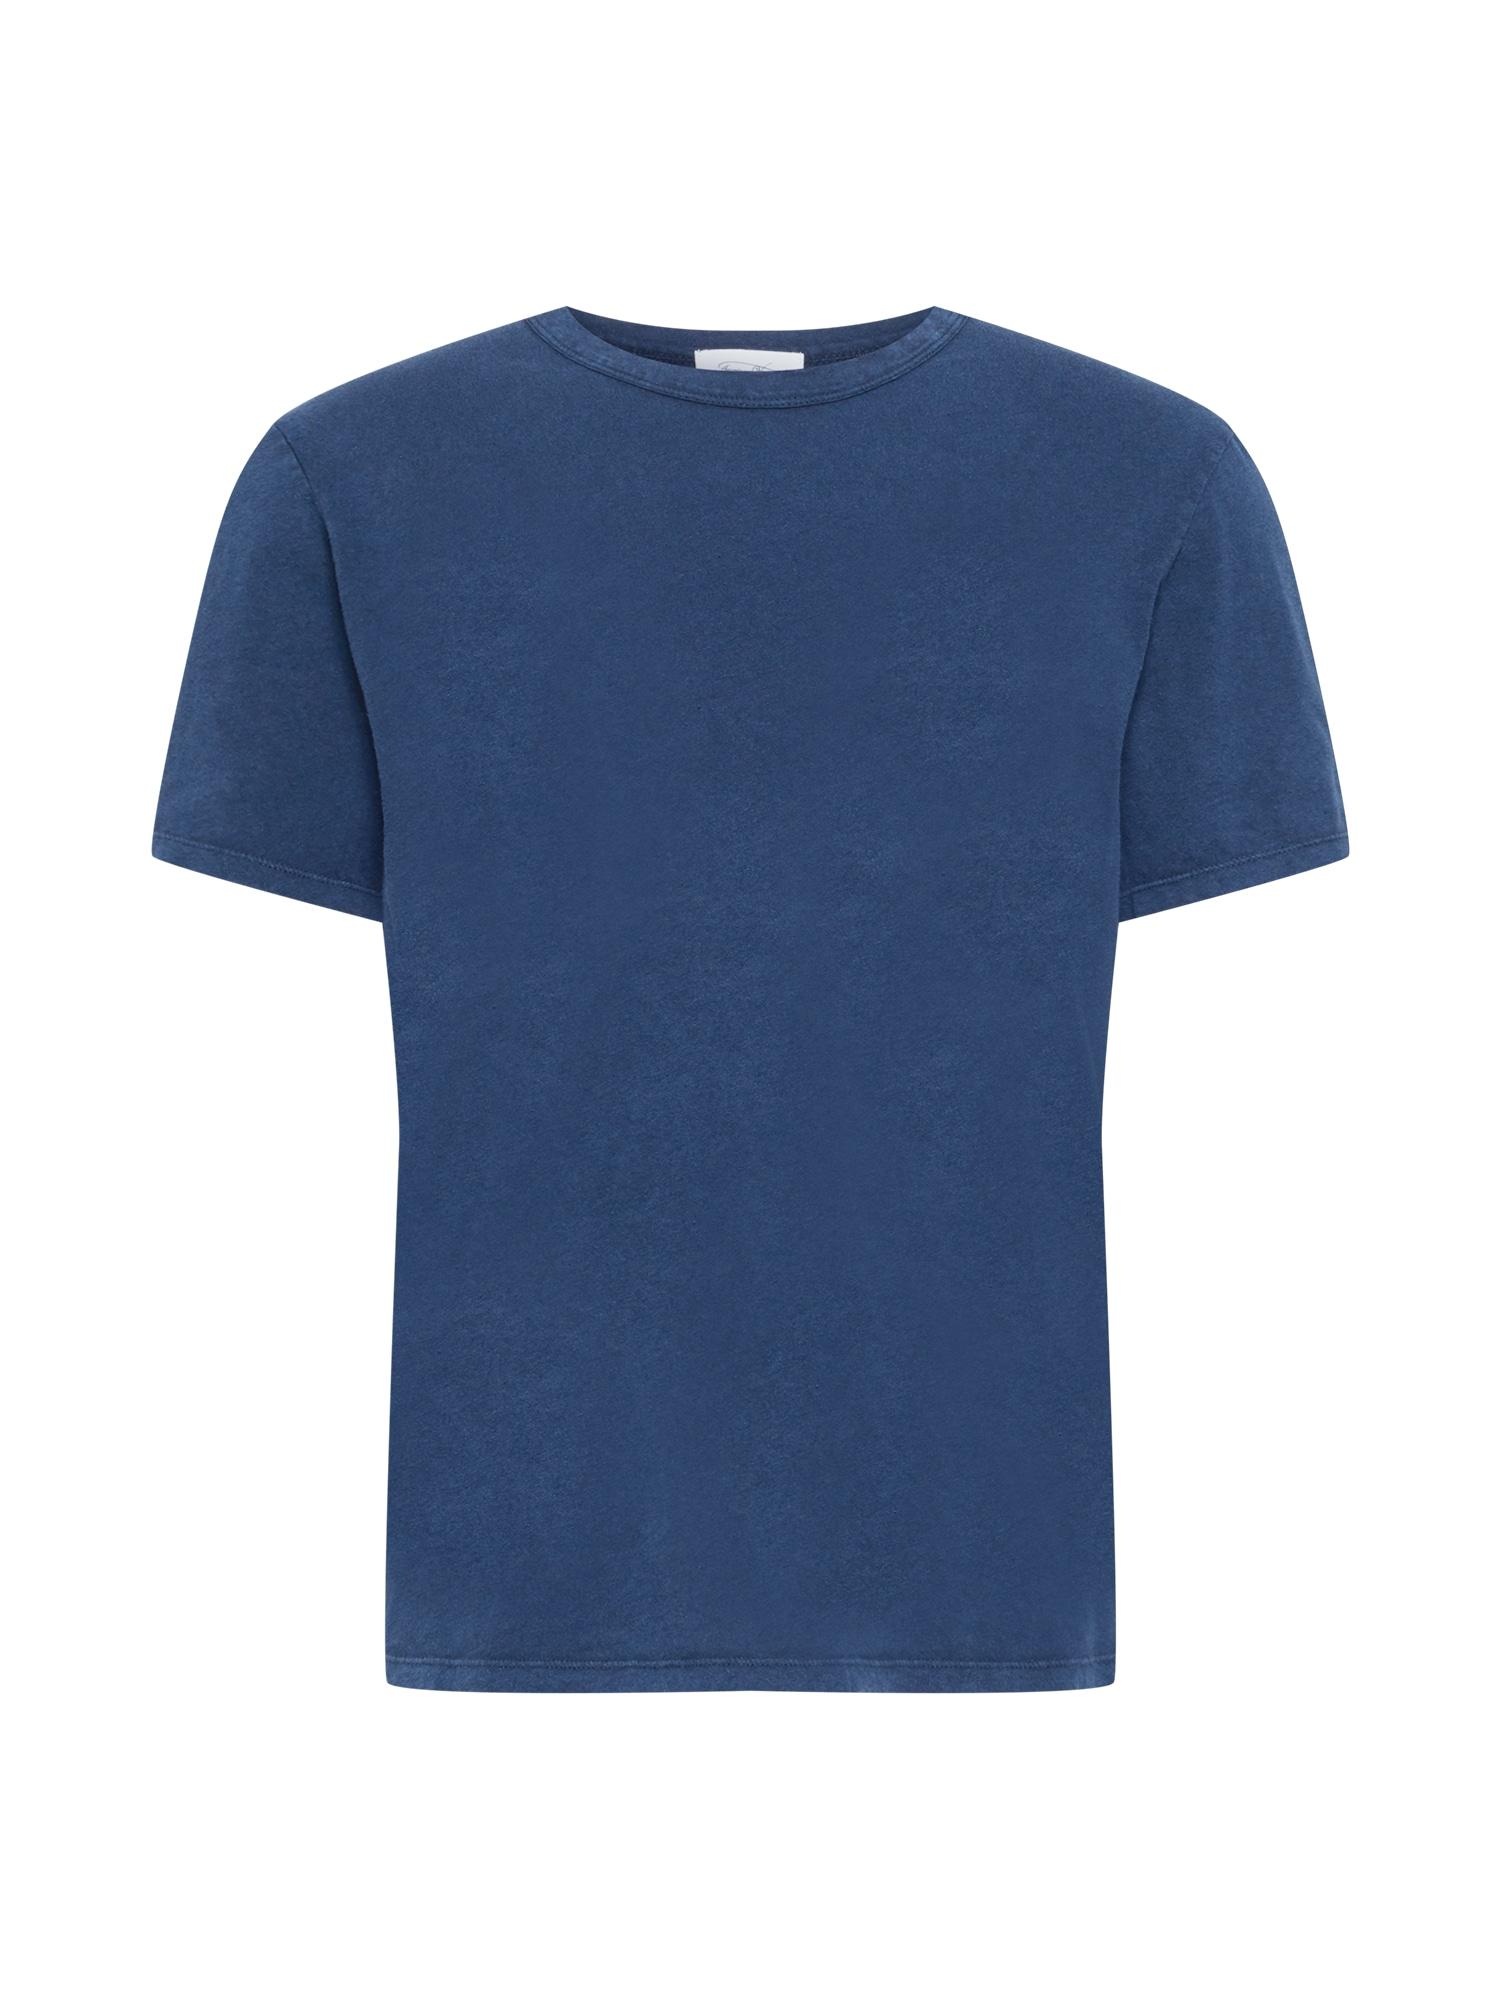 AMERICAN VINTAGE Marškinėliai 'Fakobay' mėlyna